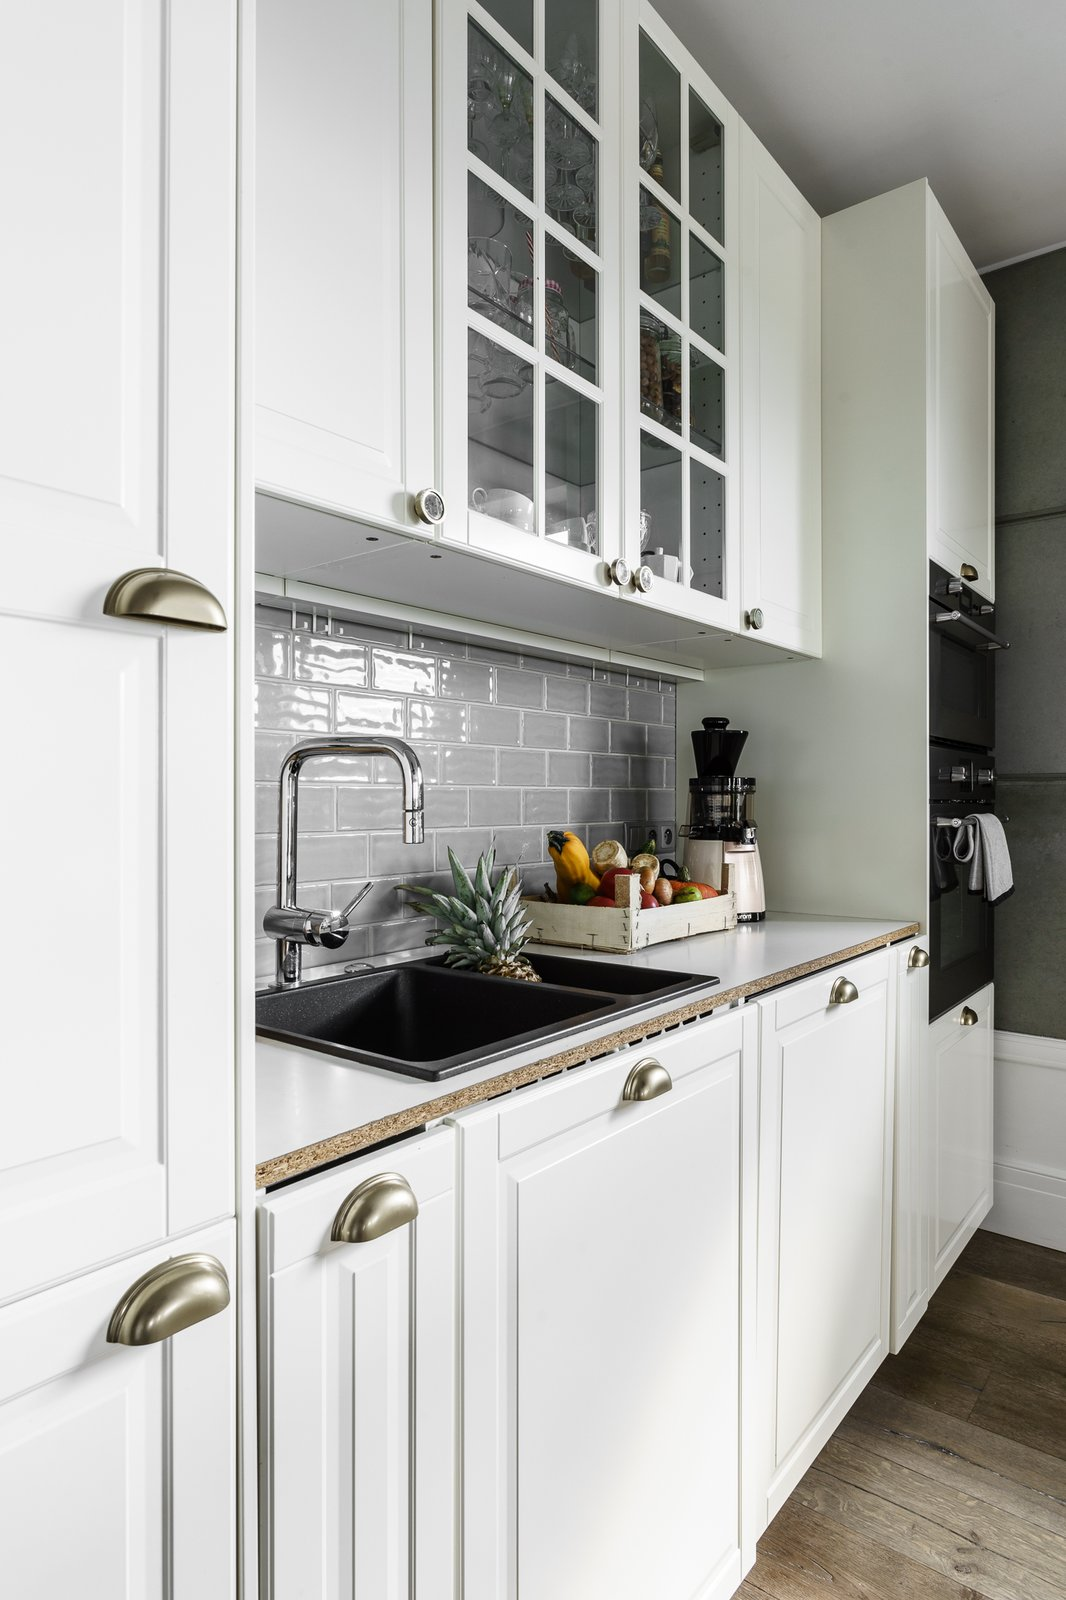 Tagged: Kitchen, Subway Tile Backsplashe, Glass Tile Backsplashe, White Cabinet, and Drop In Sink. Loft in Poland by Lucyna Kołodziejska | INTERIORS FACTORY